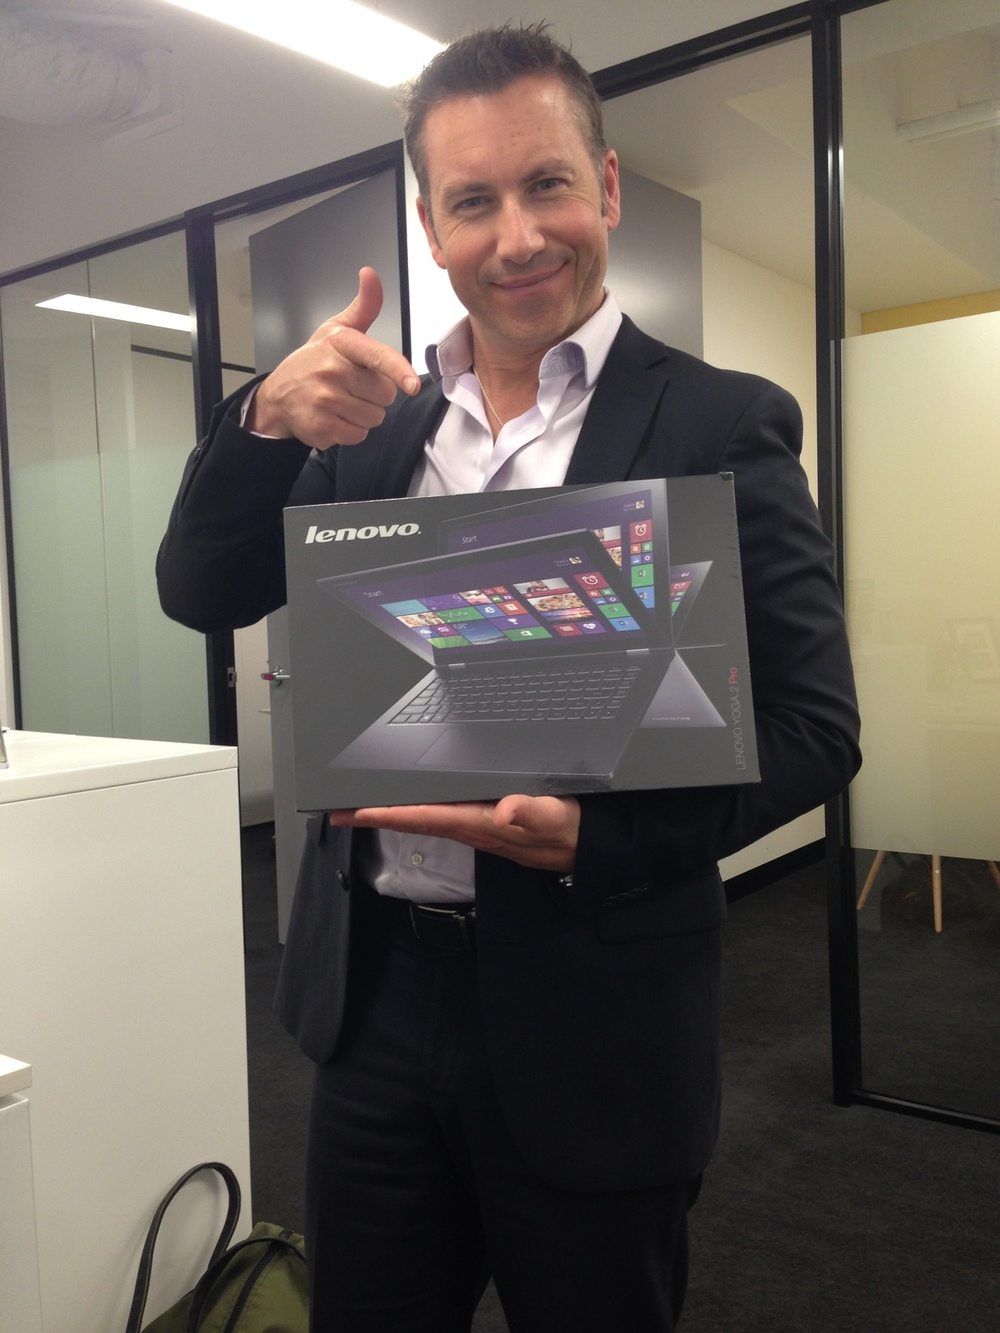 Lenovo sends me a Yoga 2 pro